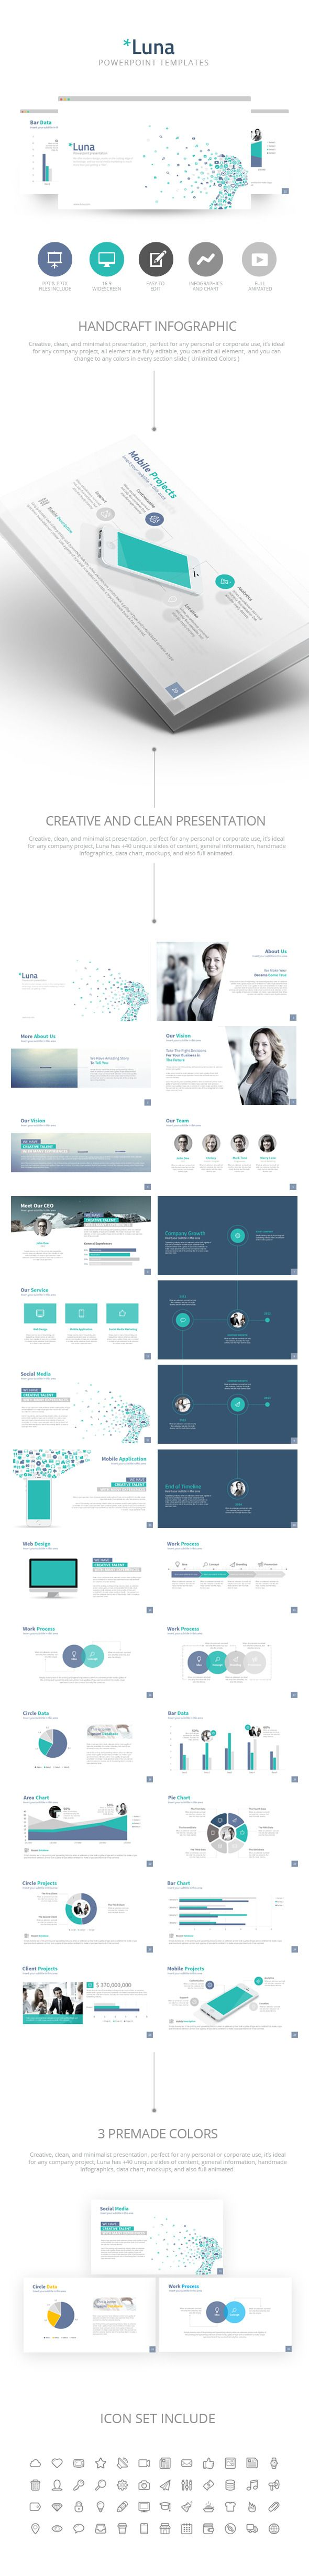 Luna Powerpoint Presentation Template PowerPoint Template / Theme / Presentation / Slides / Background / Power Point #powerpoint #template #theme